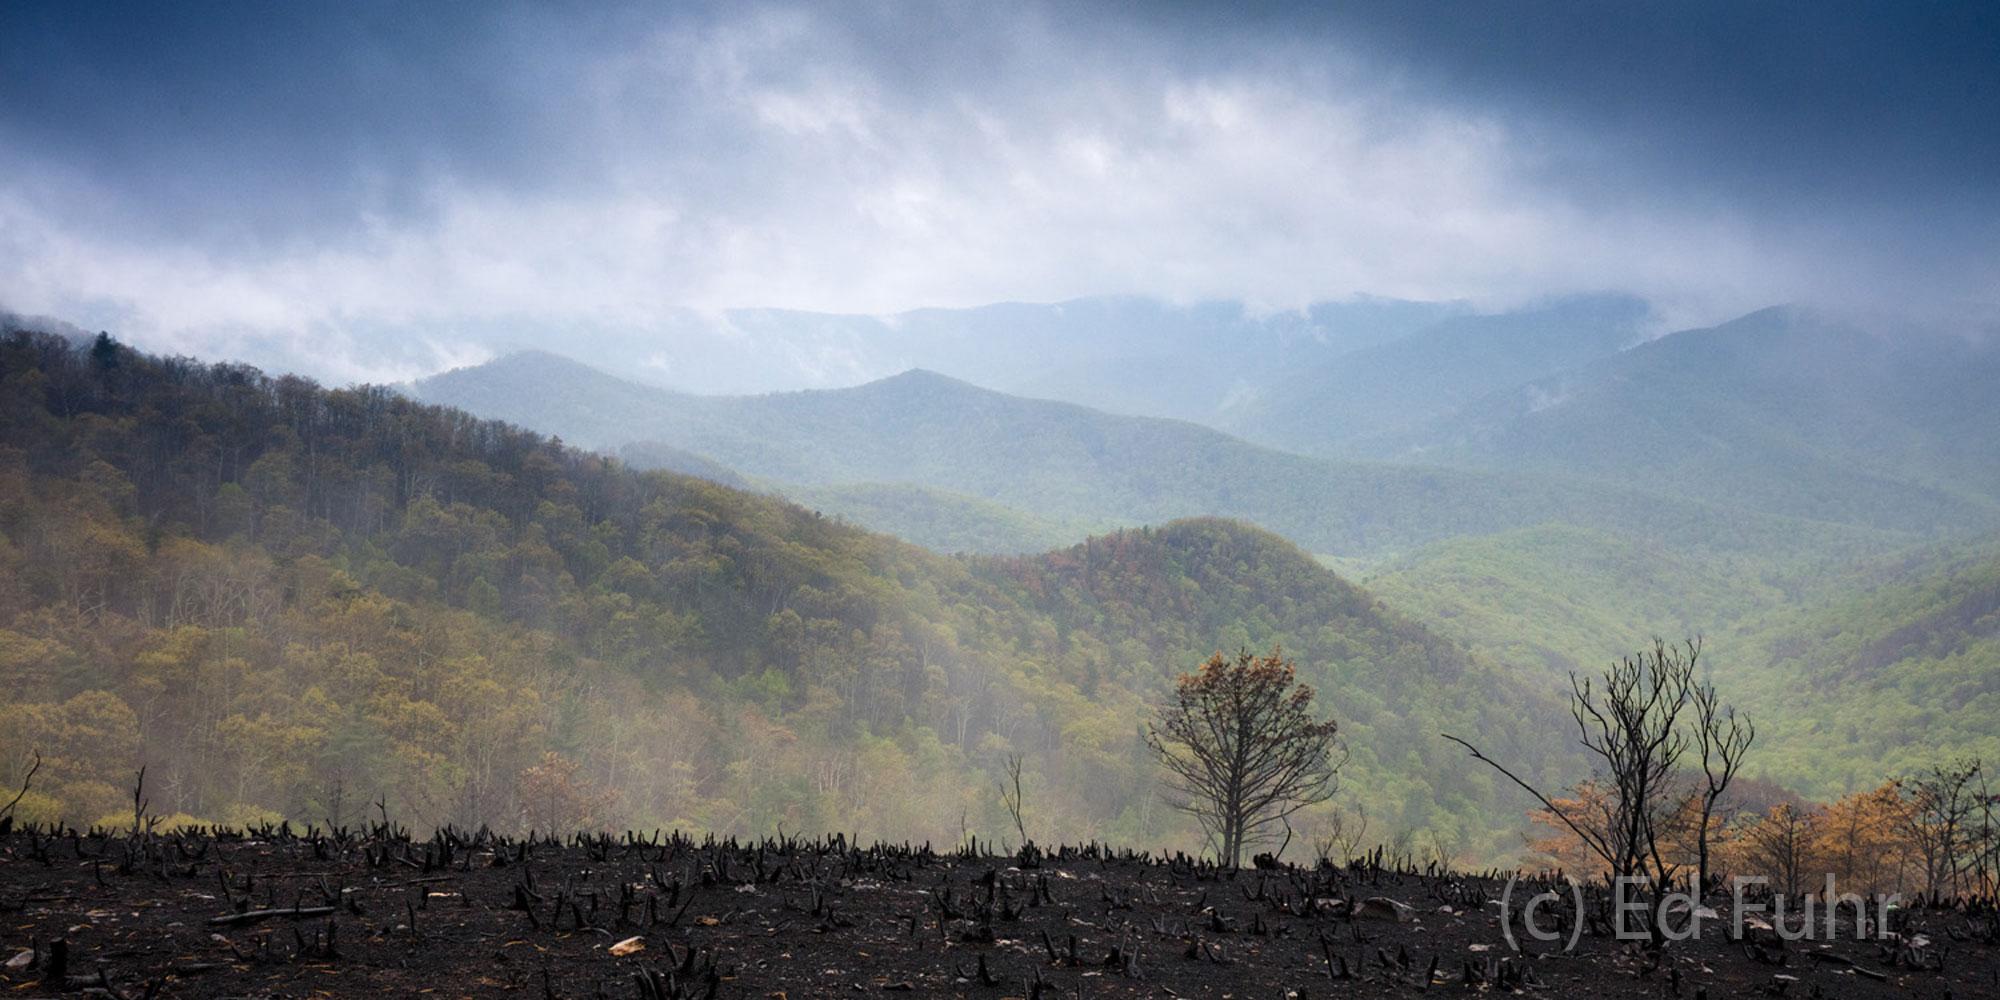 Shenandoah national park, image, photograph, fire, fog, panorama, spring, photo